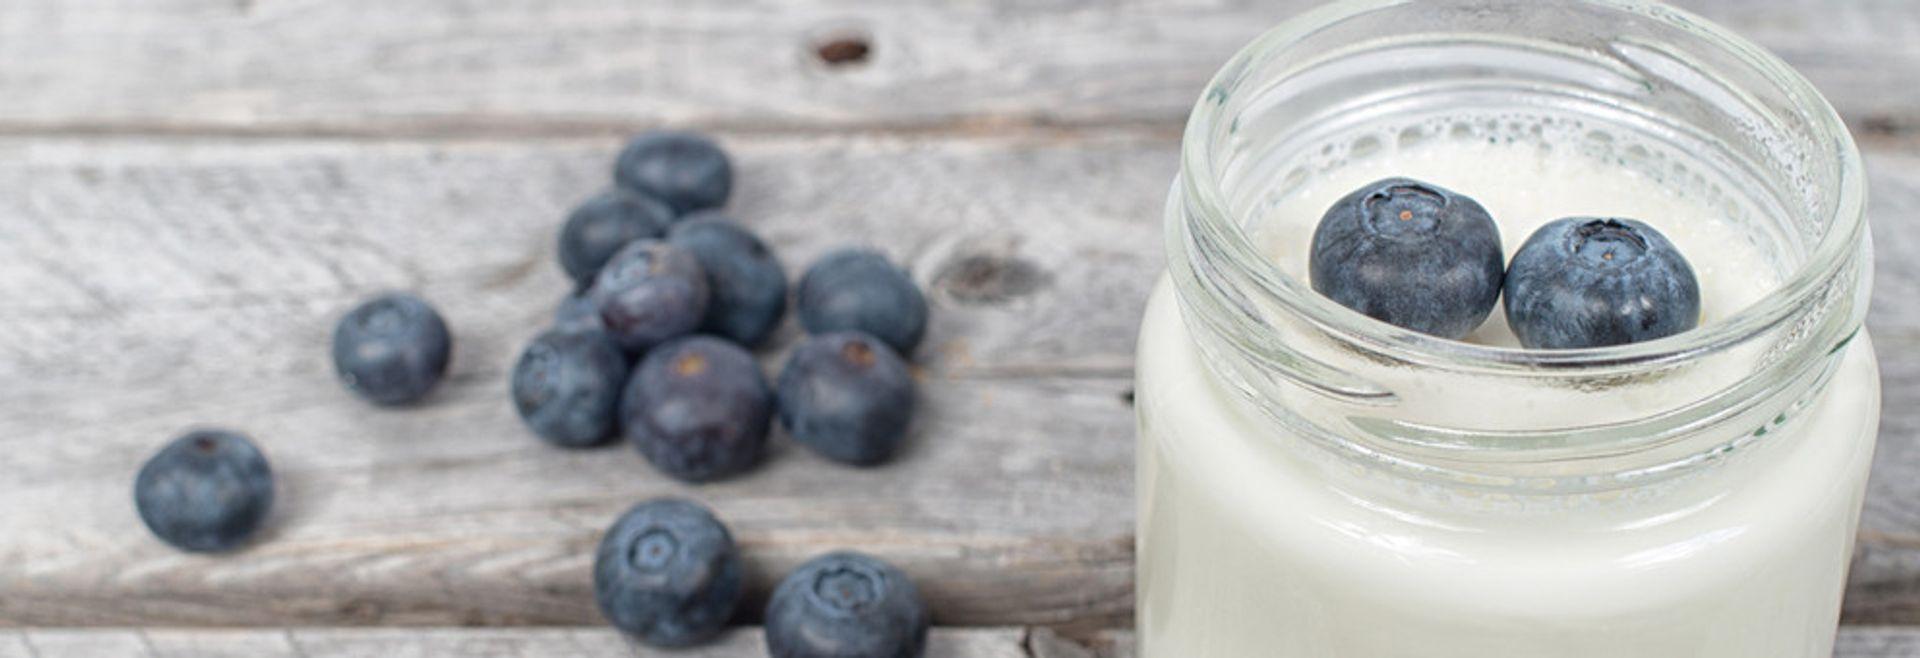 Blueberries and Probiotics